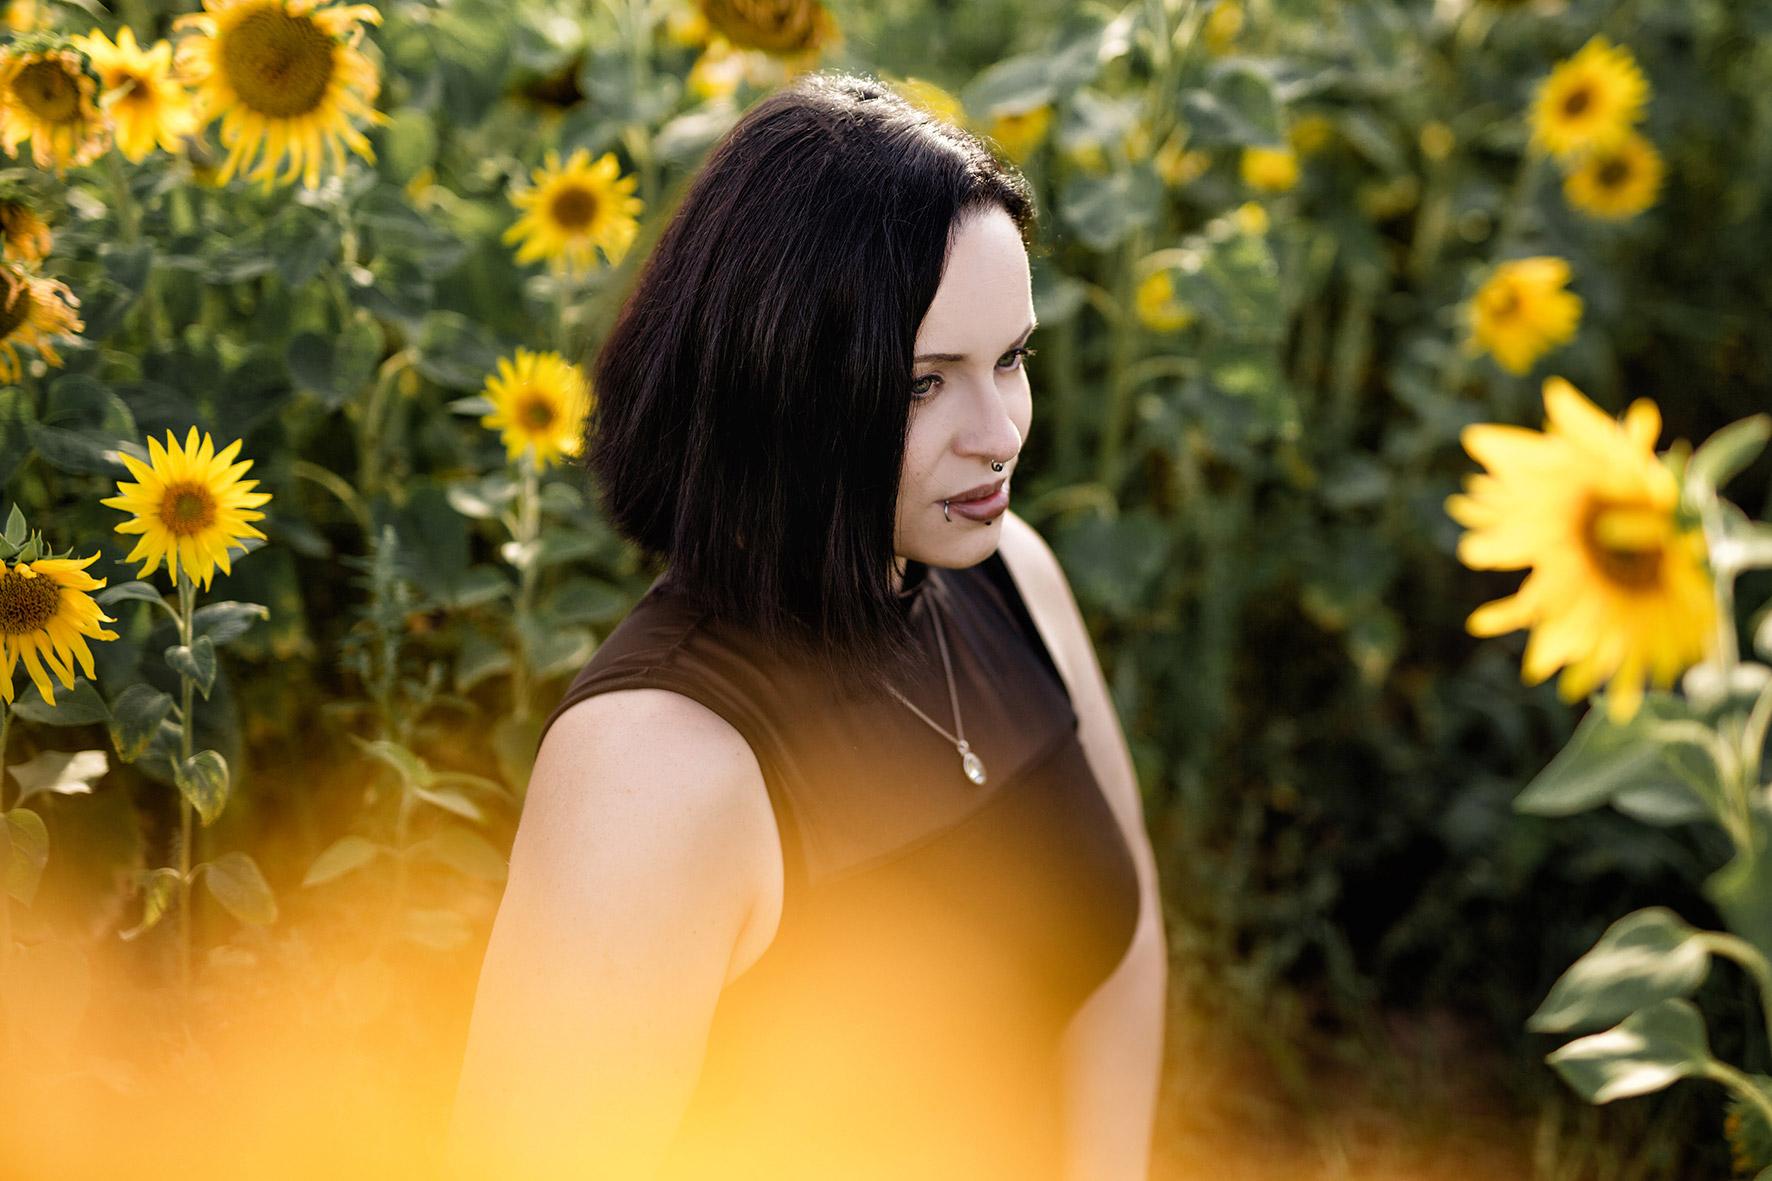 Fotoshooting mit Sonnenblumen